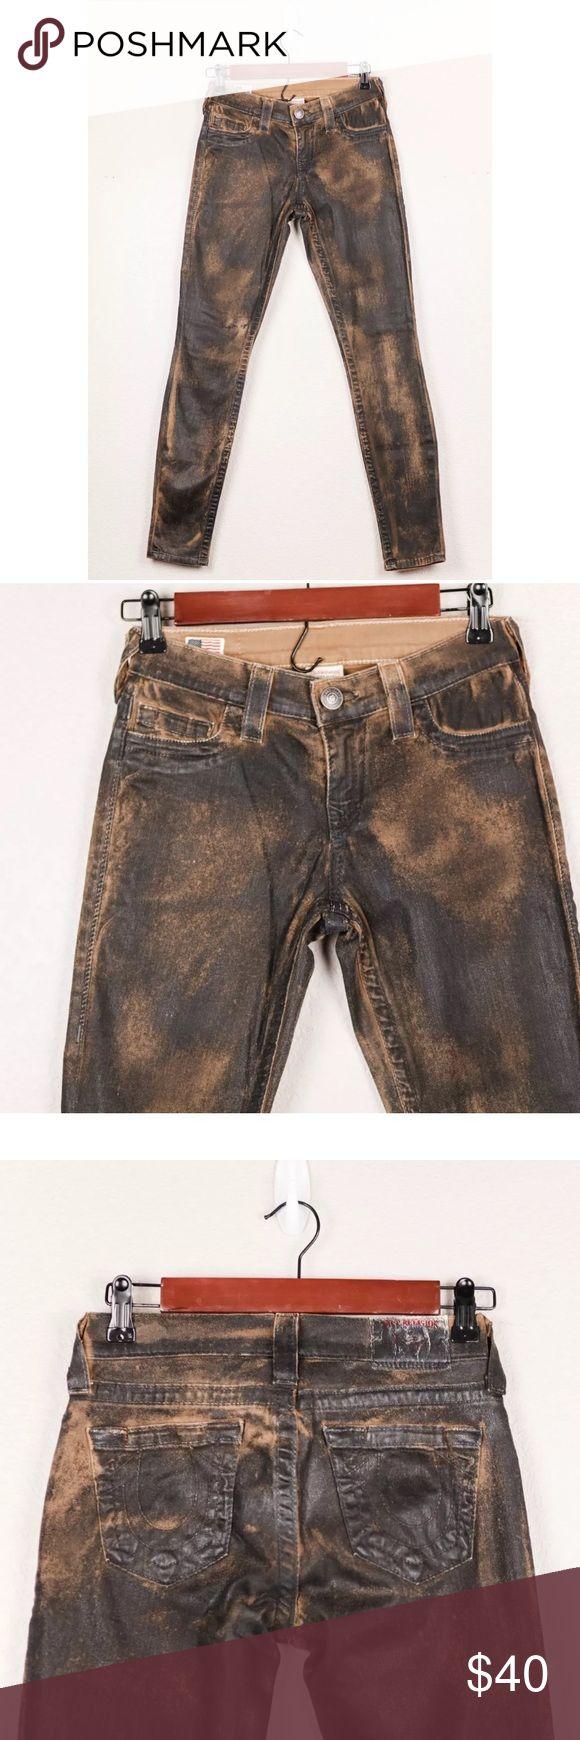 True Religion Black Brown Super Skinny Color Jeans True Religion Women's Mid Rise Burnt Black Brown Super Skinny Colored Jeans 24  Waist: 12 Length: 38 Inseam: 30 True Religion Jeans Skinny